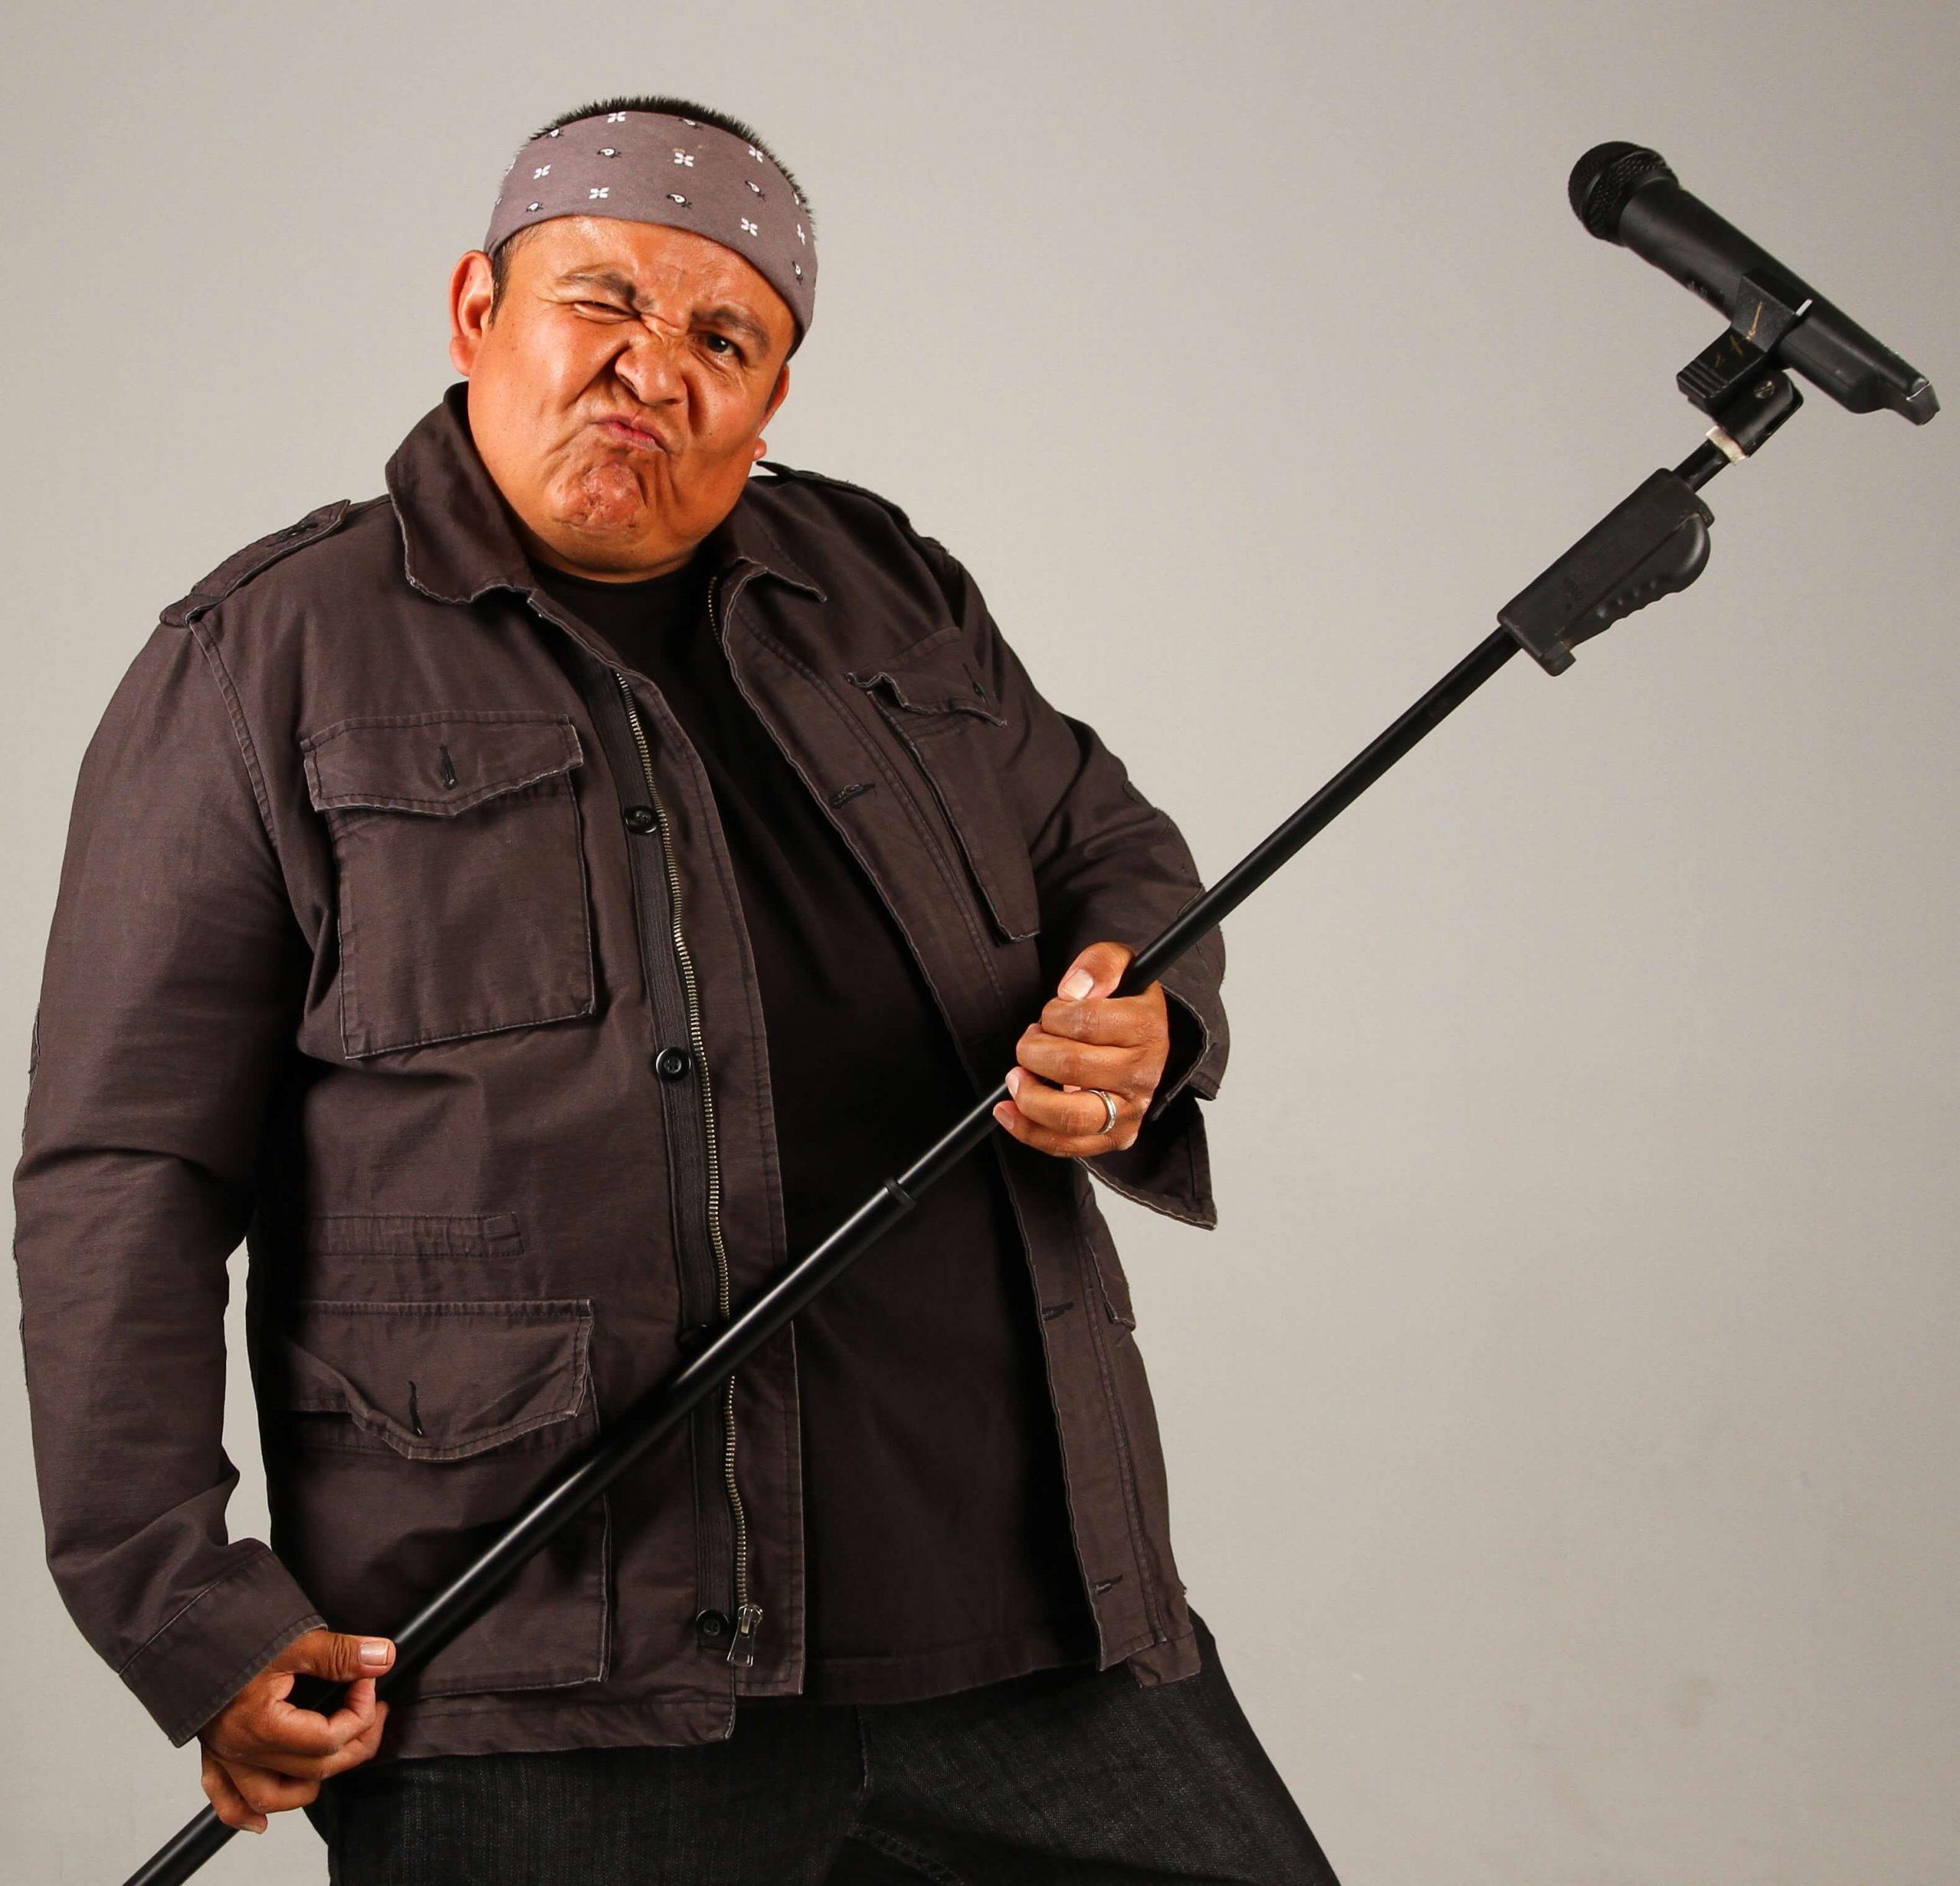 Ernie-Tsosie-speaker